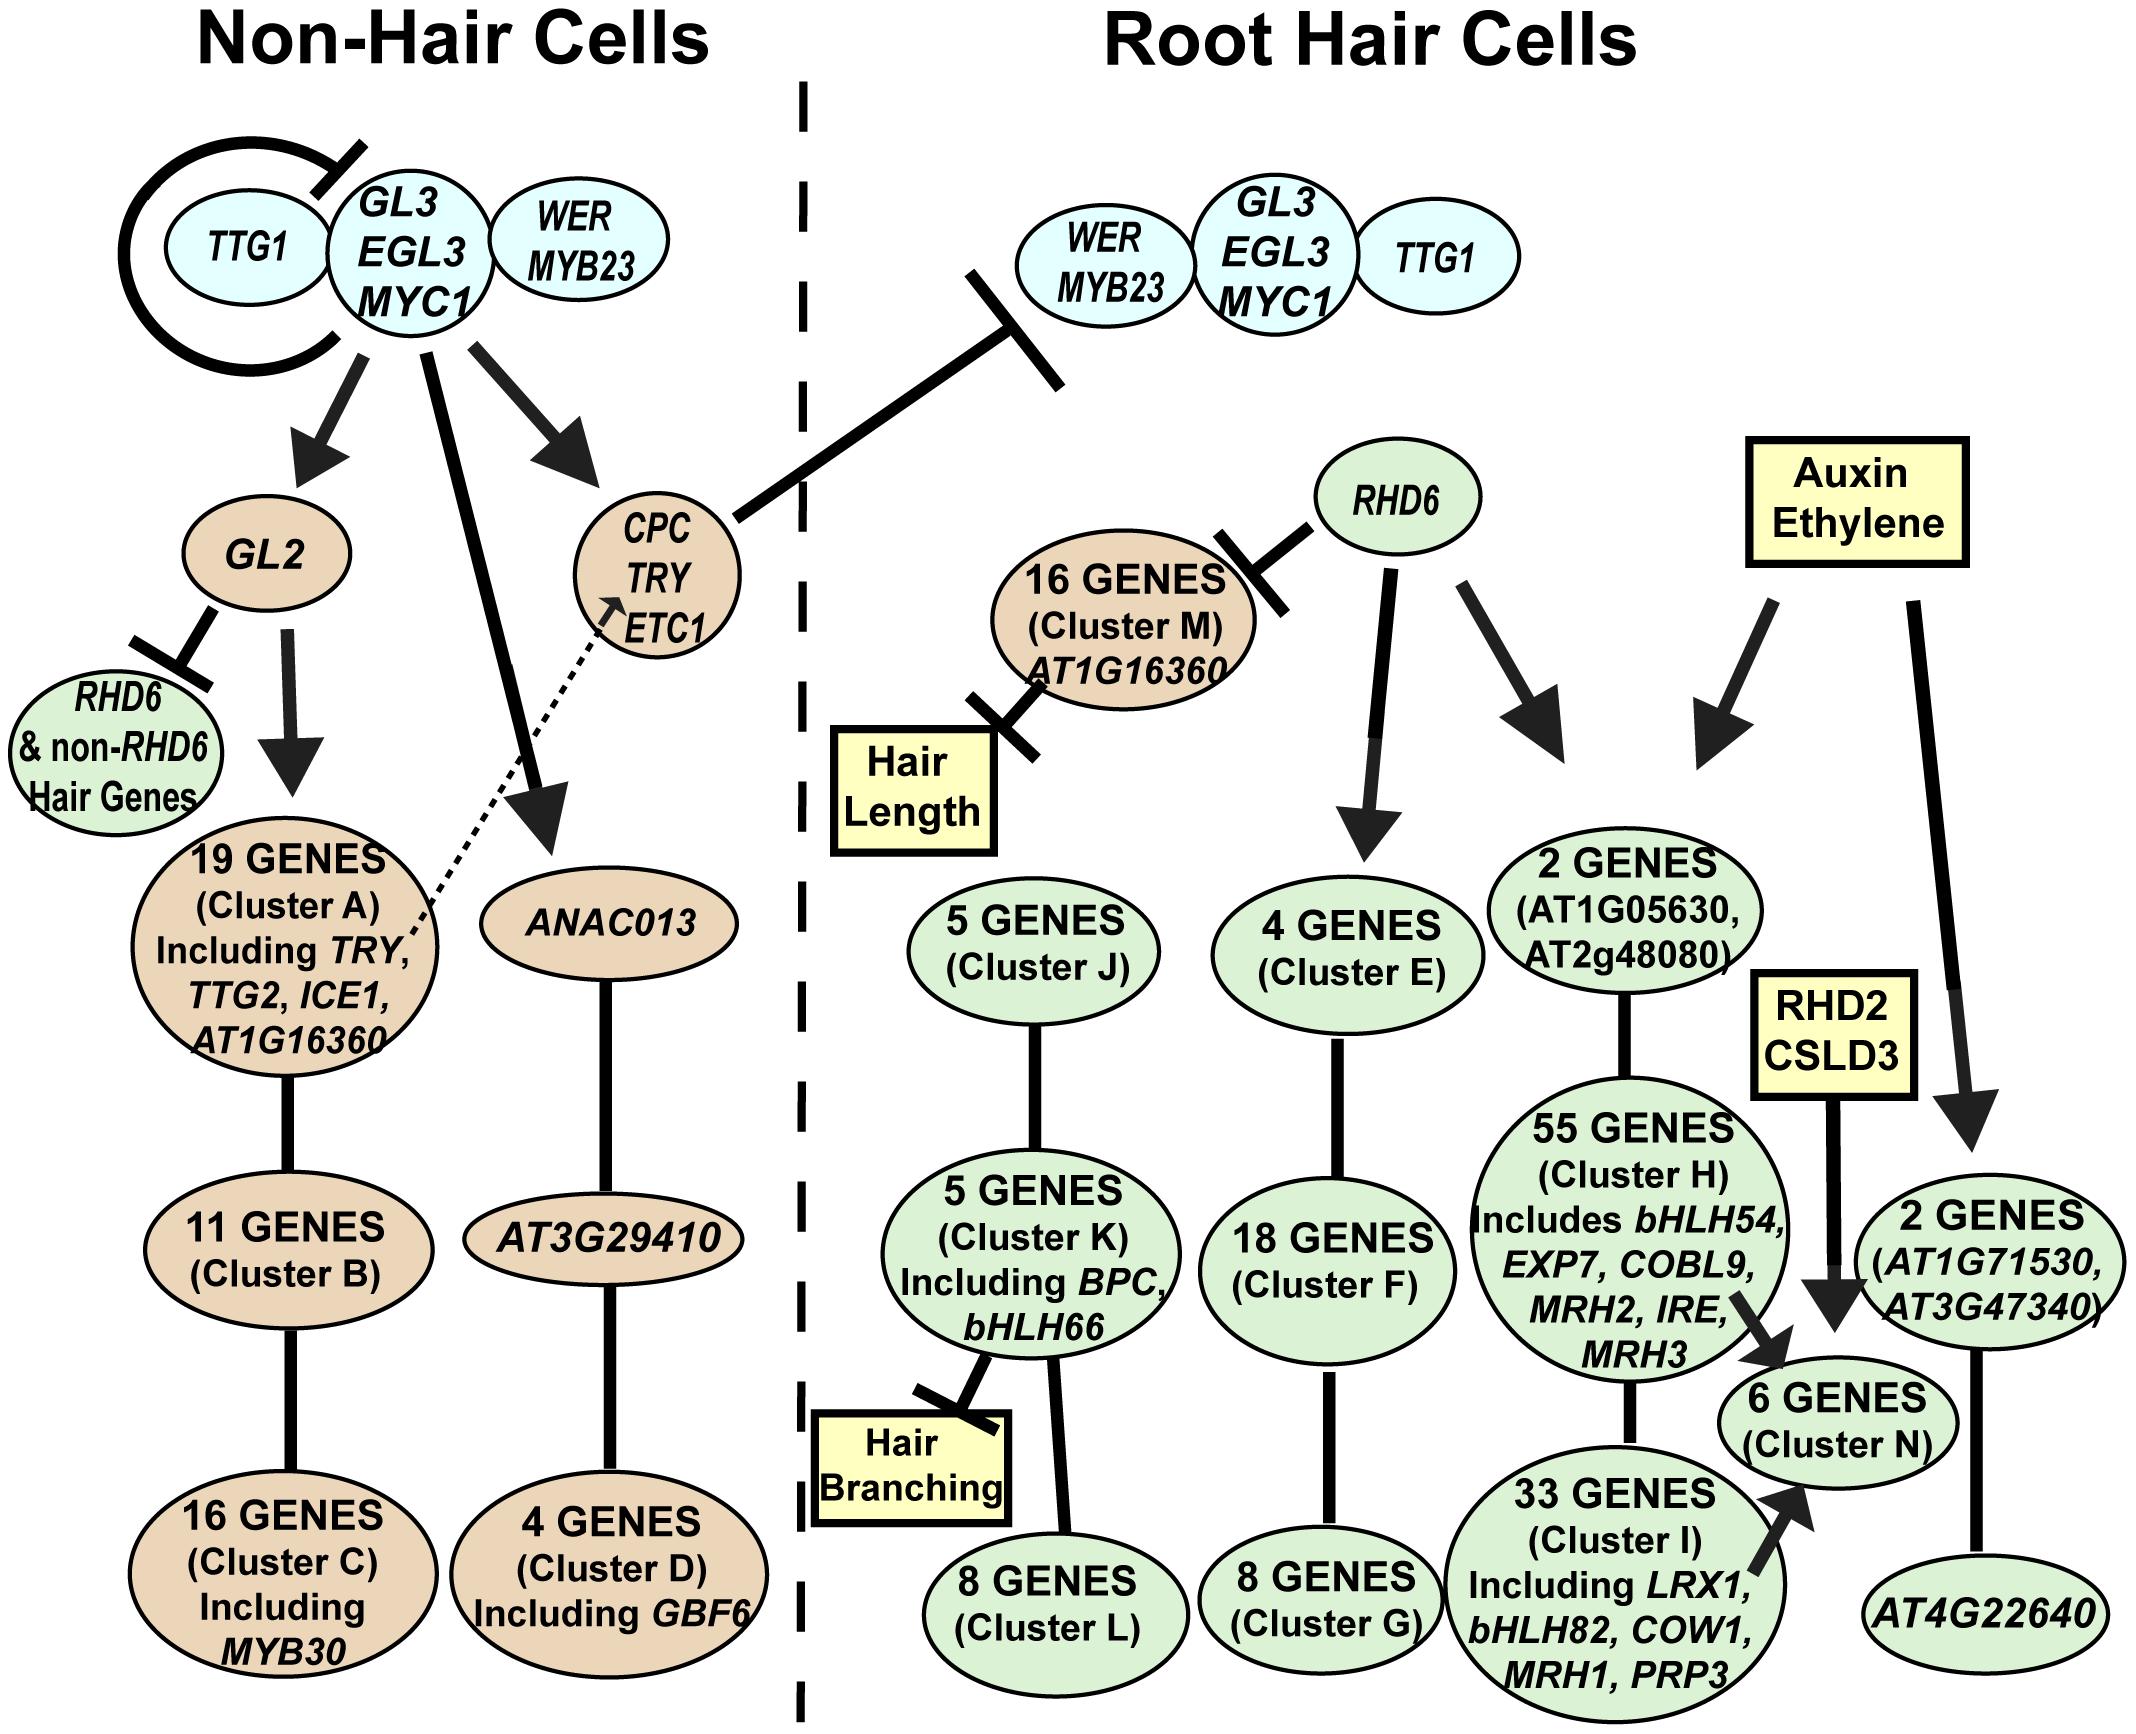 Model of the root epidermal gene network.